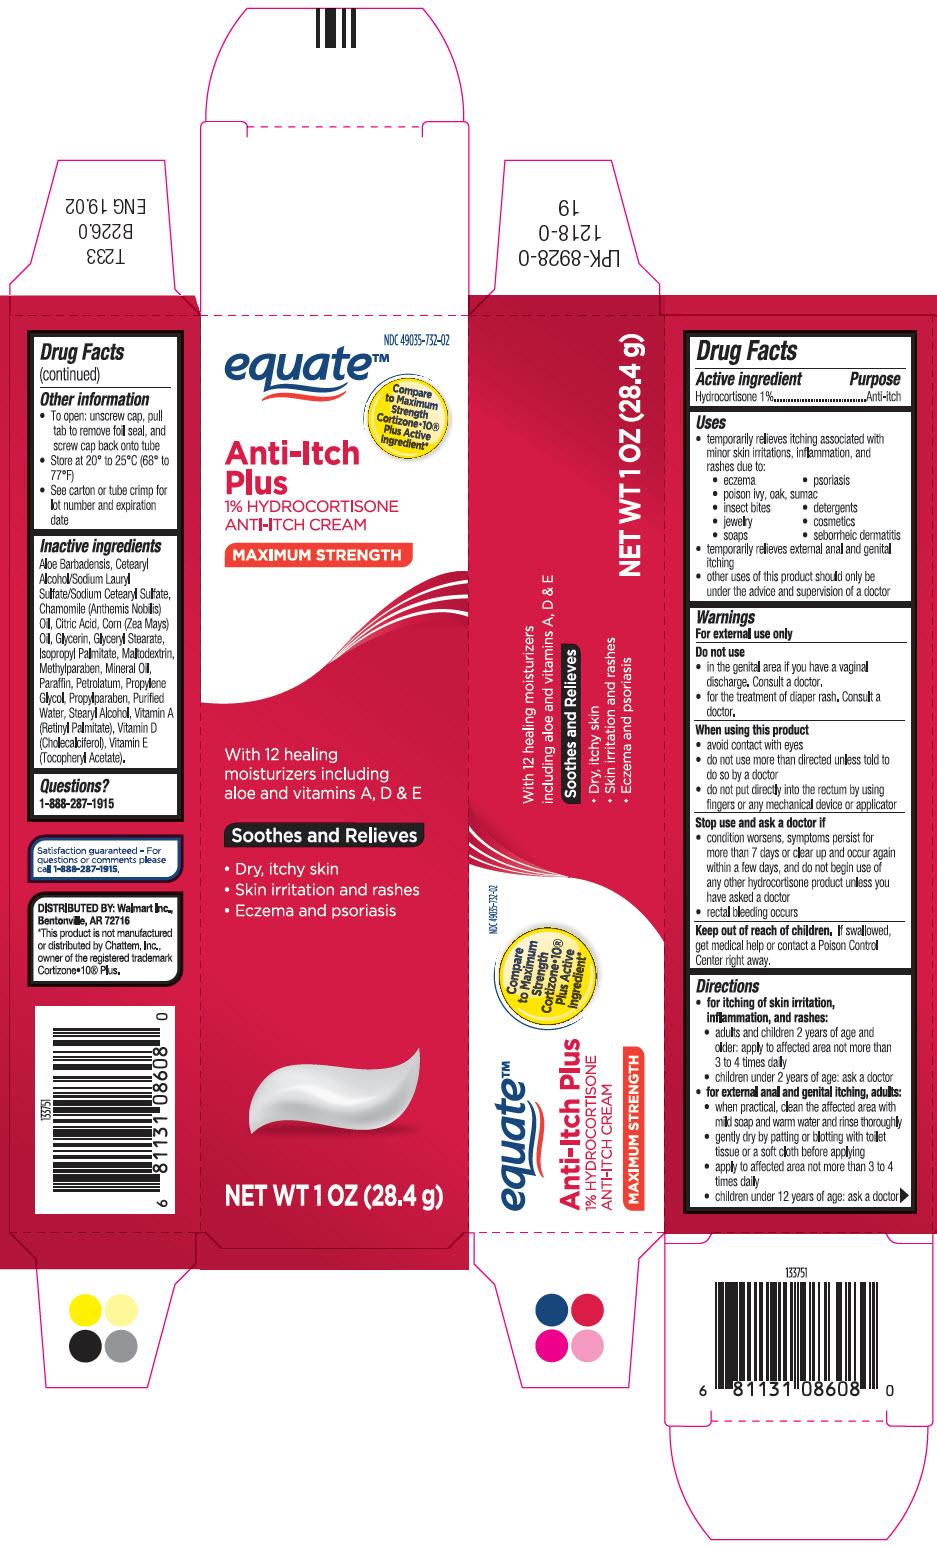 Hydrocortisone Anti-itch Plus (Hydrocortisone) Cream [Wal-mart Stores, Inc.]